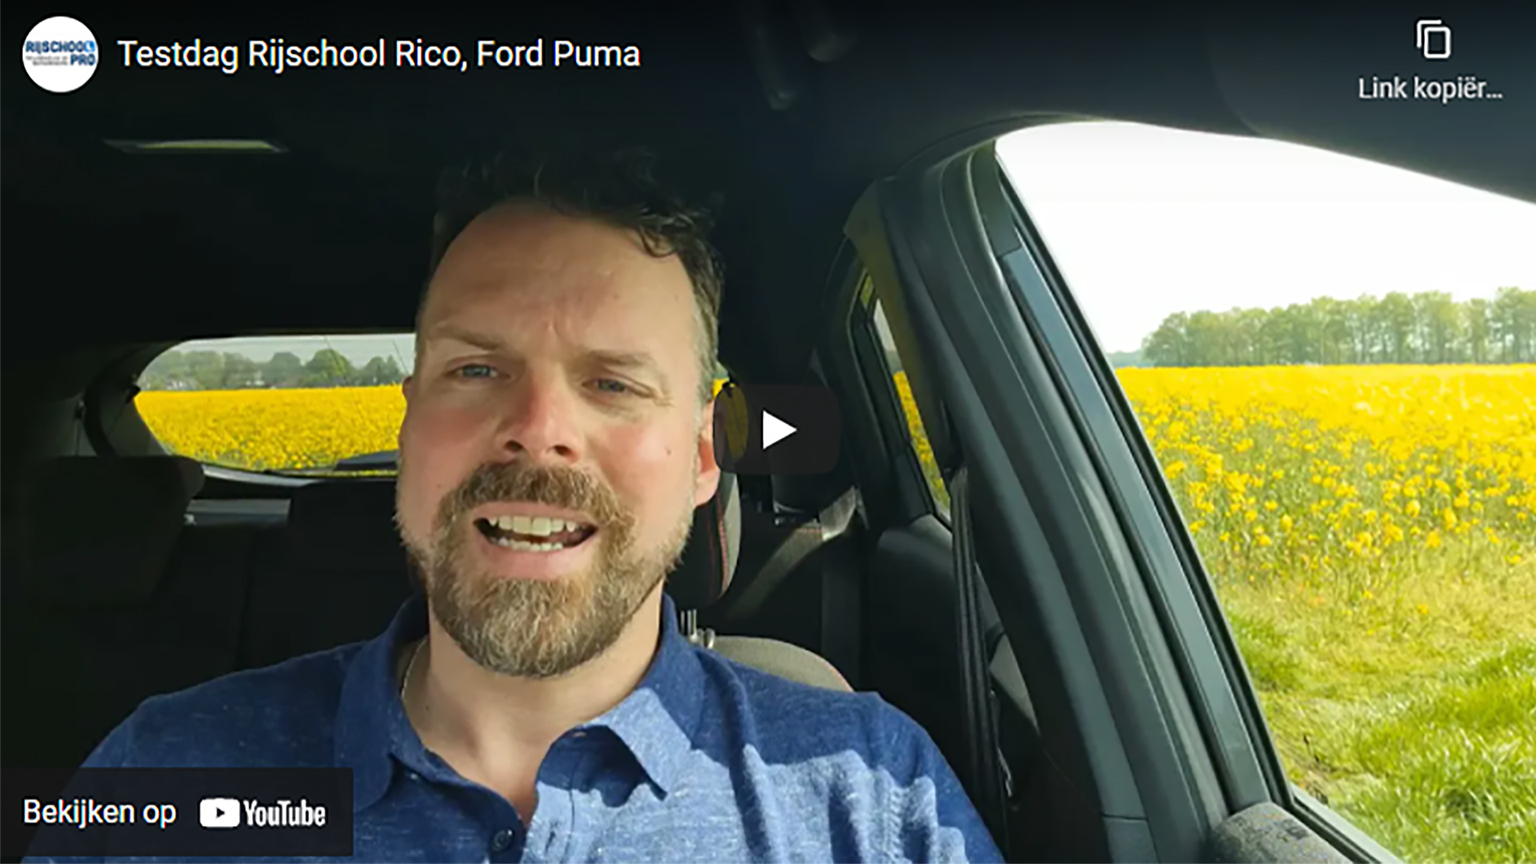 Ford Puma rijtest: Rijschool Rico